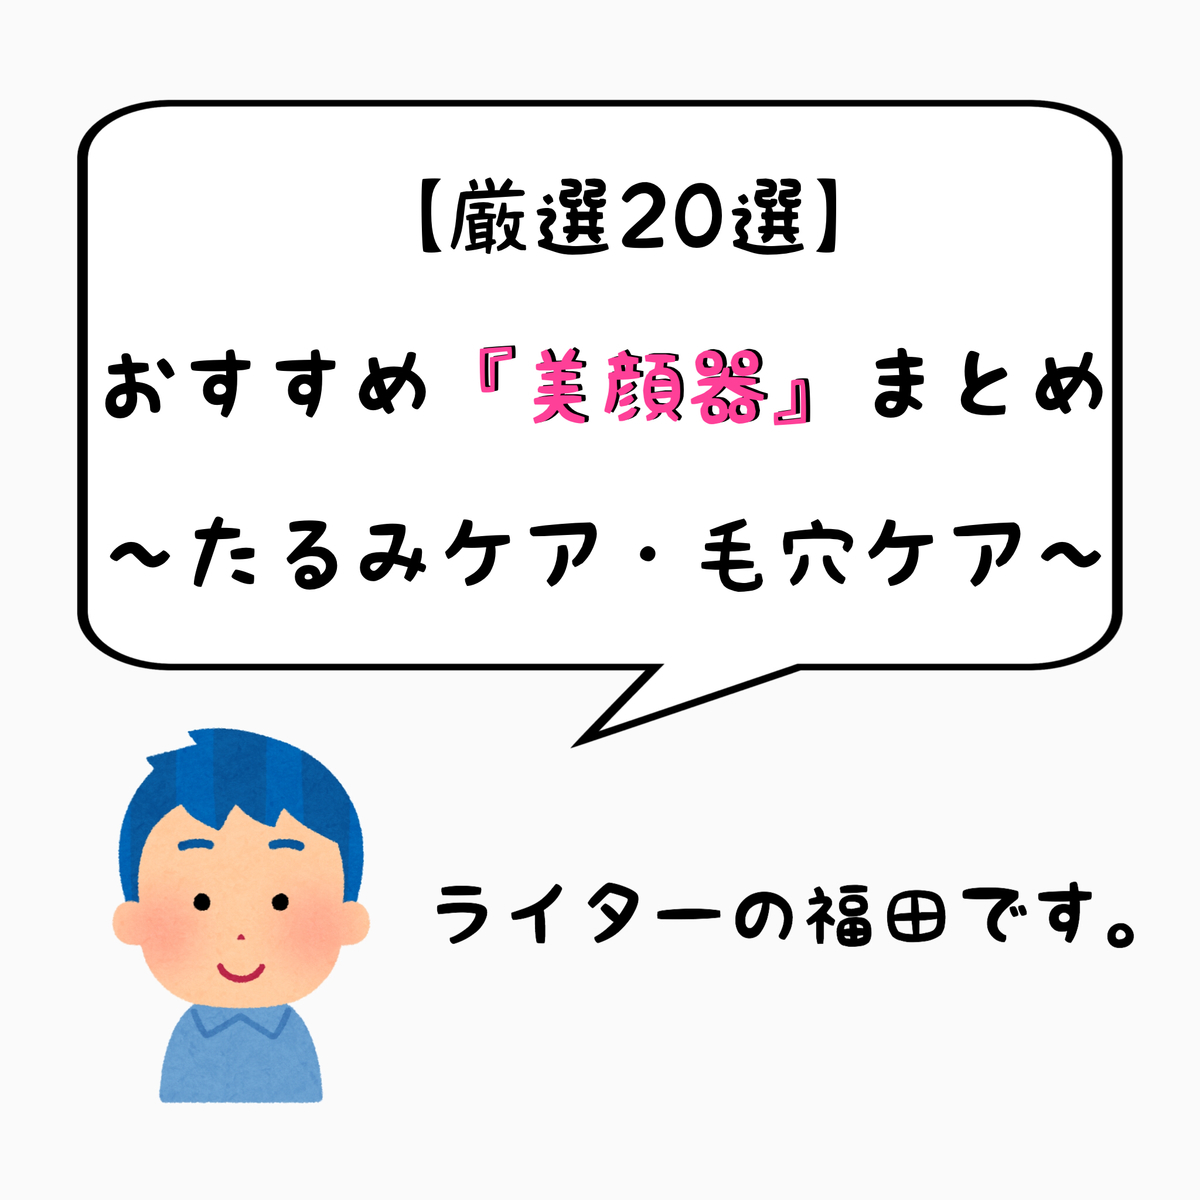 f:id:nokonoko_o:20210116194835j:plain